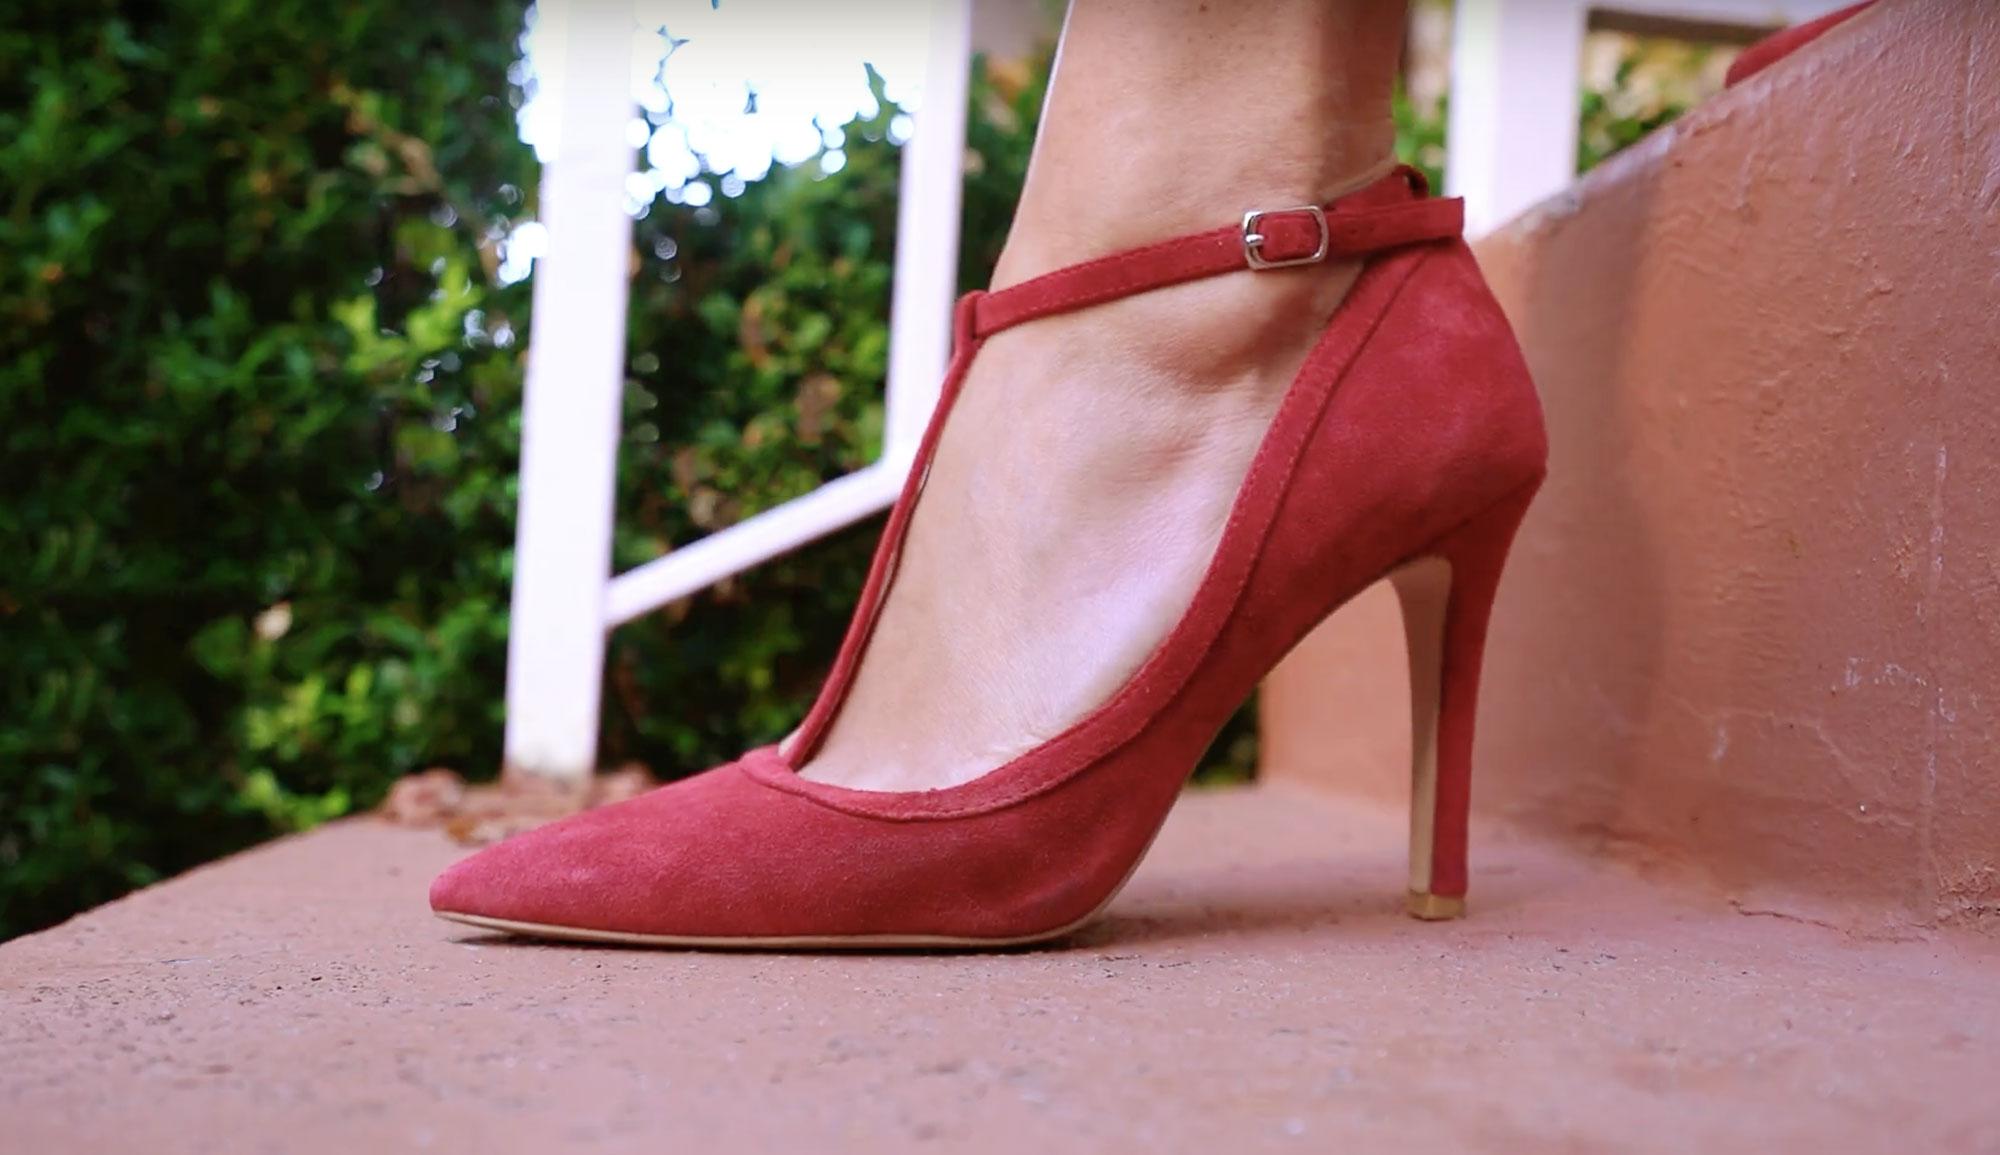 How to walk in heels - چطور در میهمانی ها کم سن و سال تر و جوان تر به نظر برسیم؟